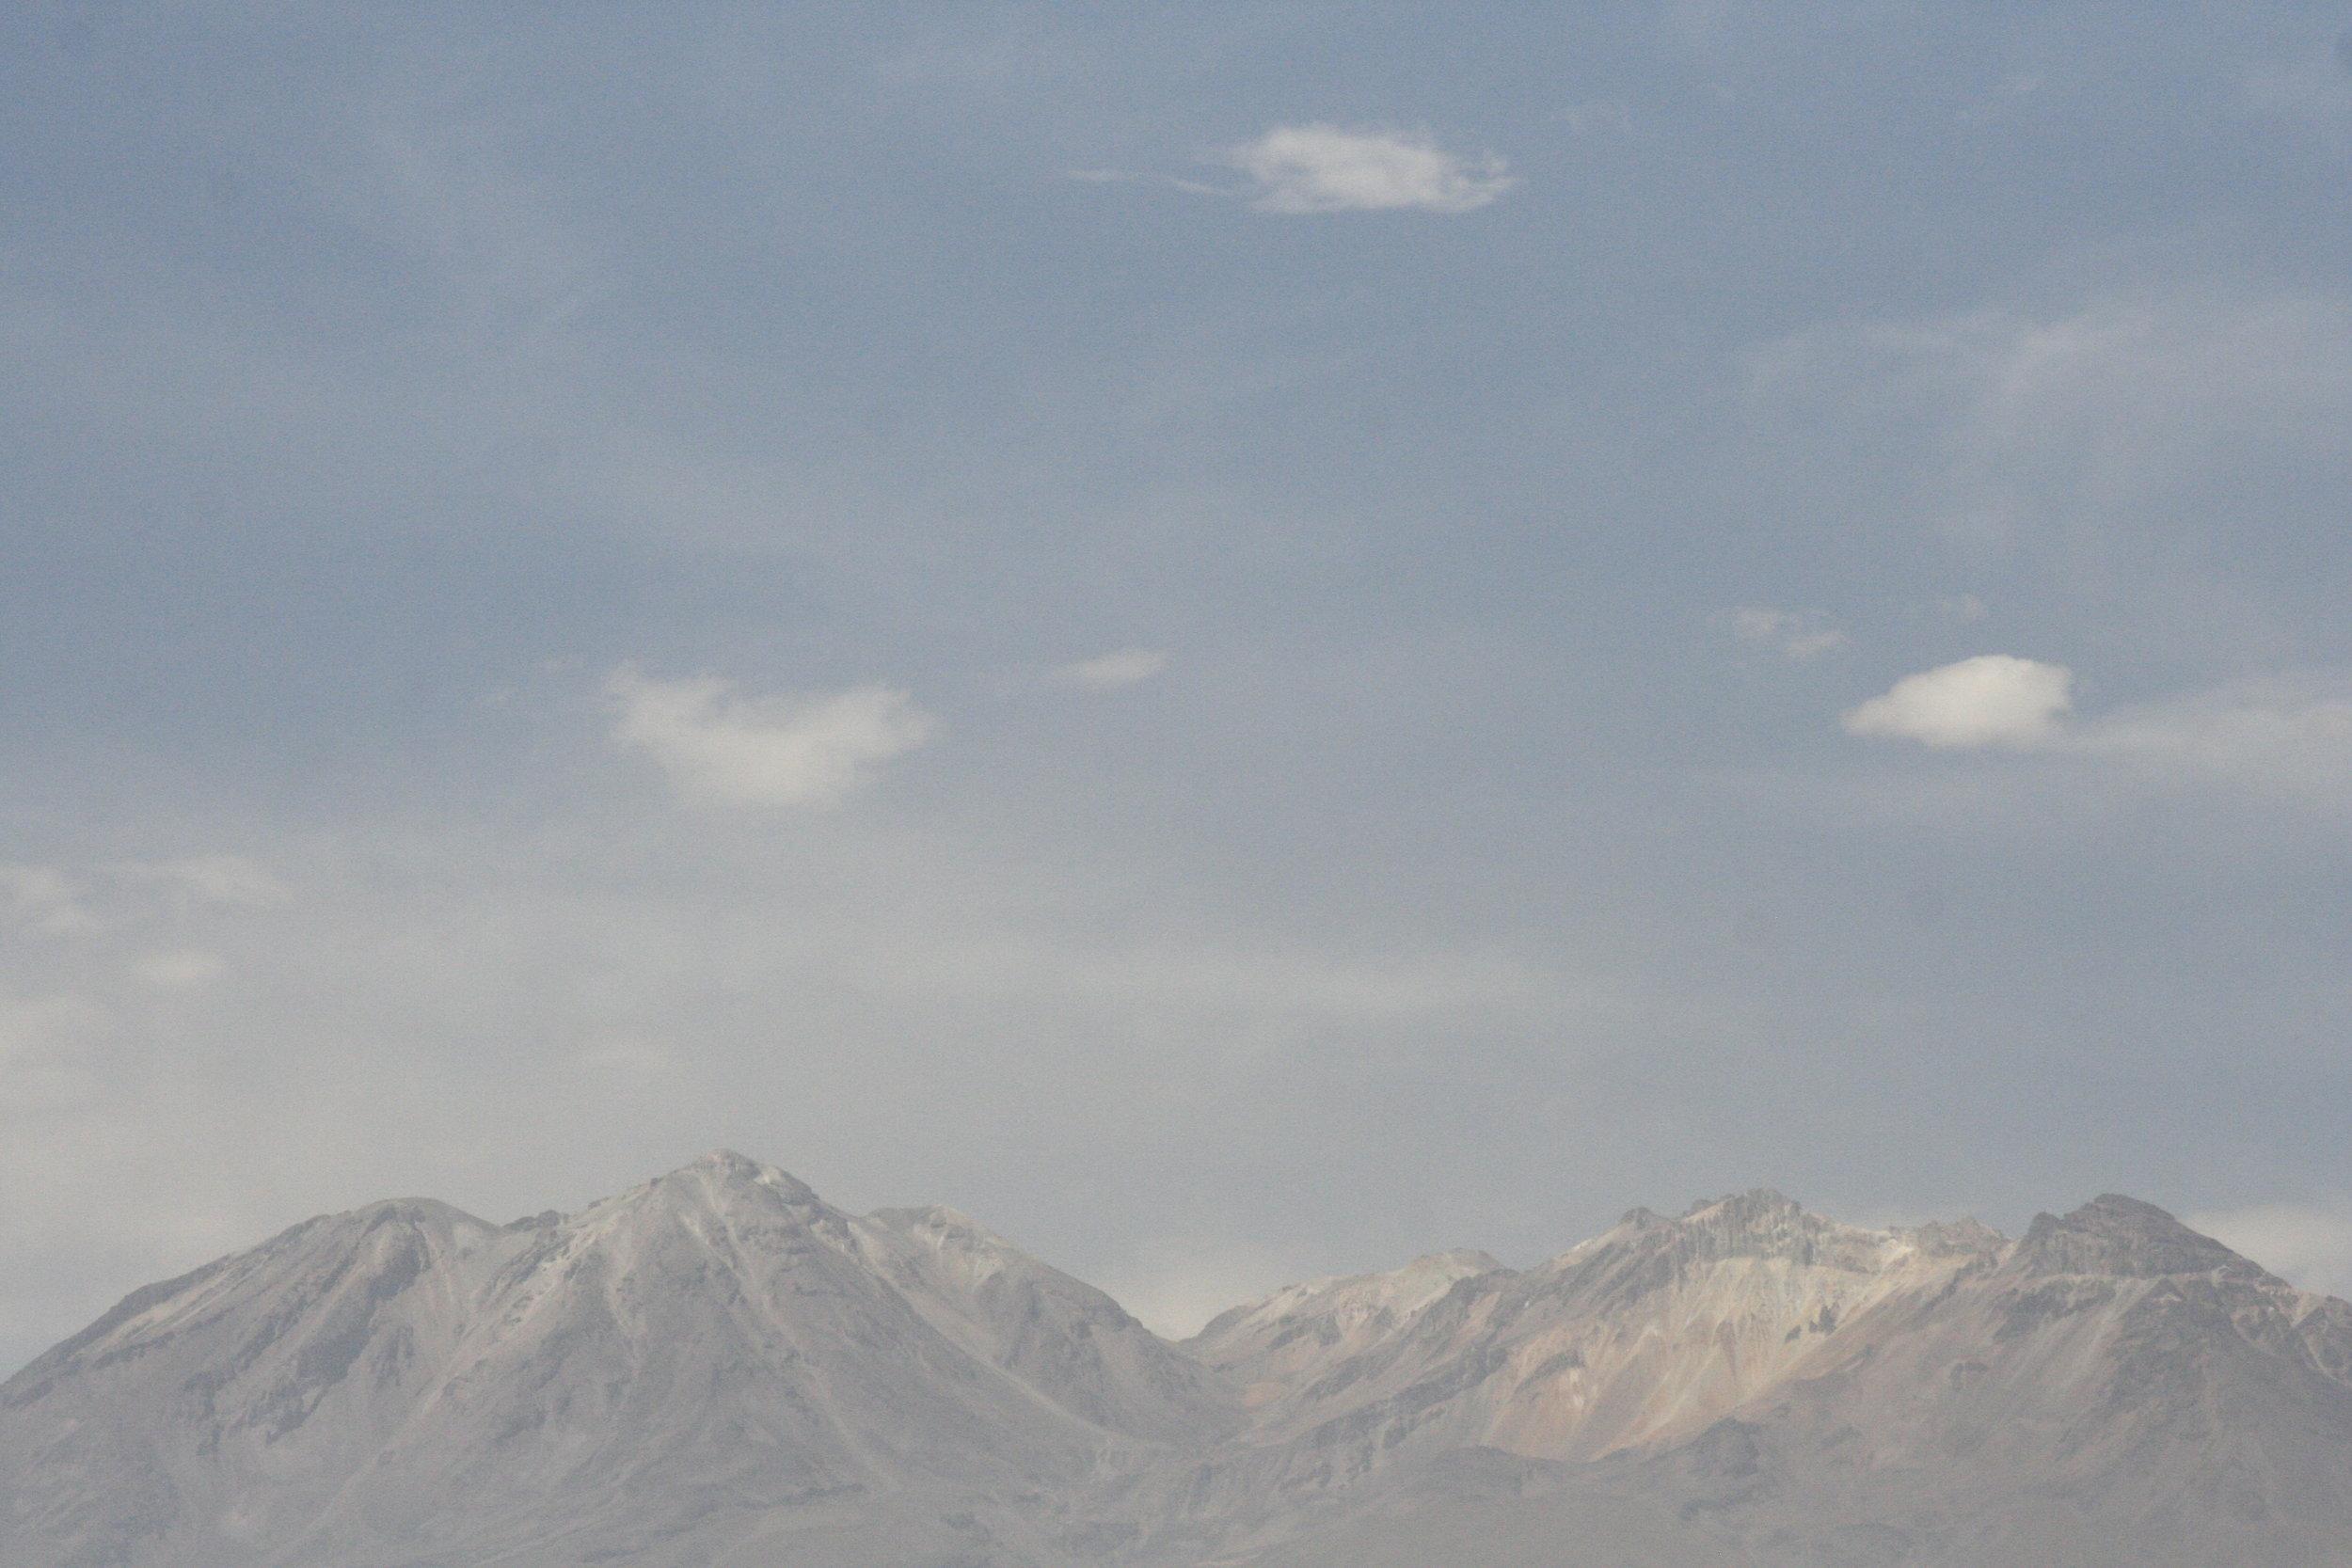 HAZE. AREQUIPA, PERU. JANUARY 2016.